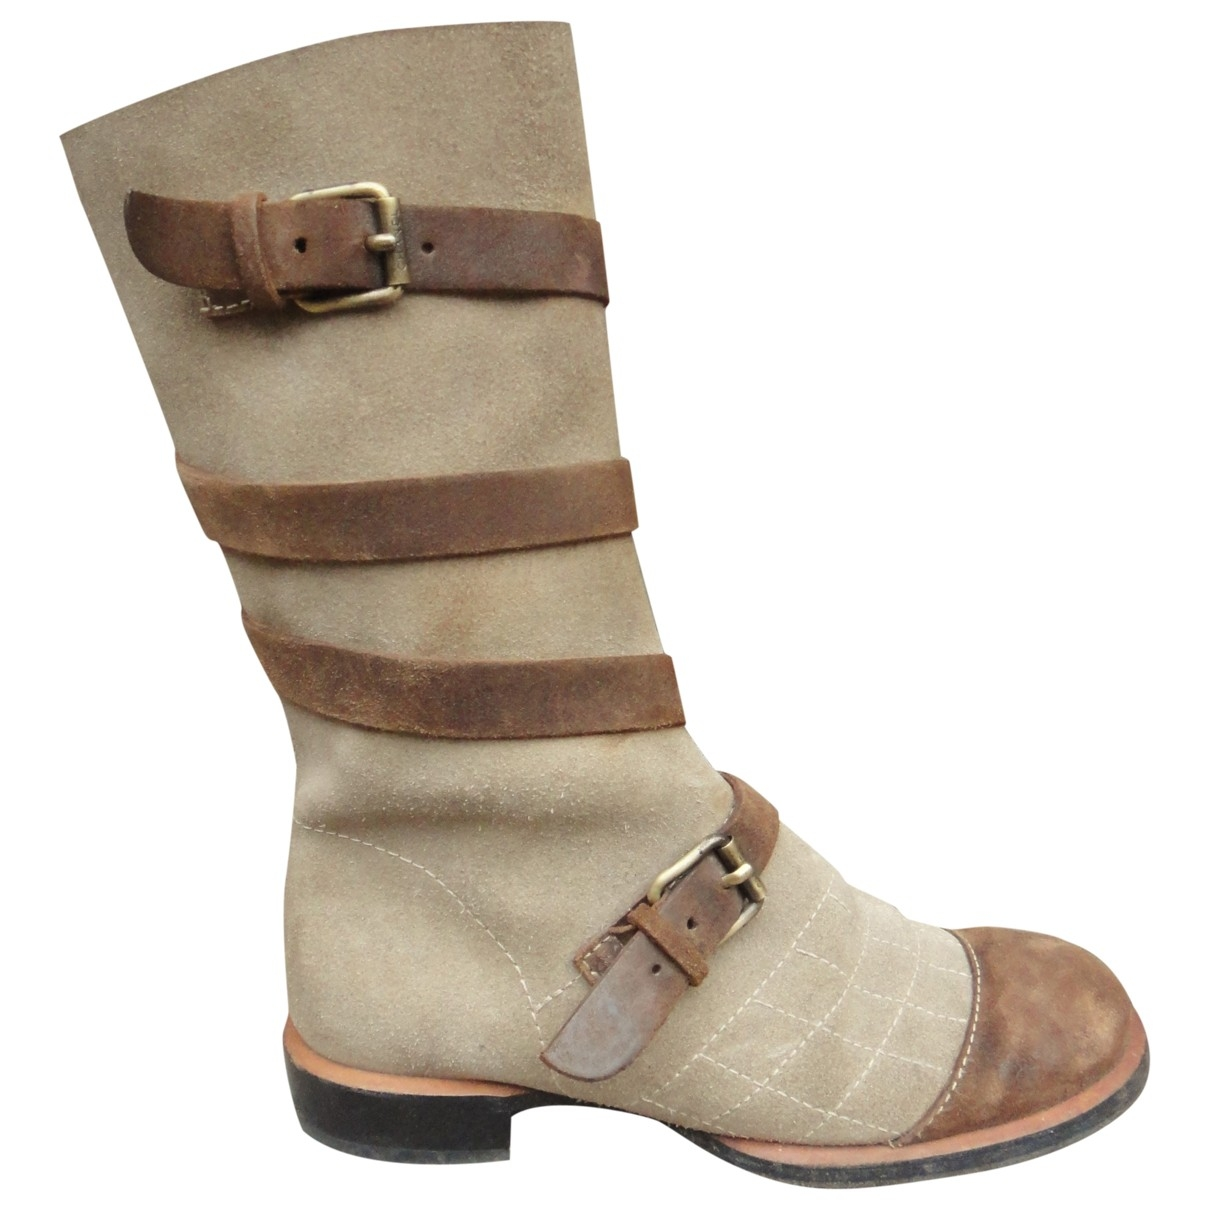 Chanel \N Beige Suede Boots for Women 37.5 EU